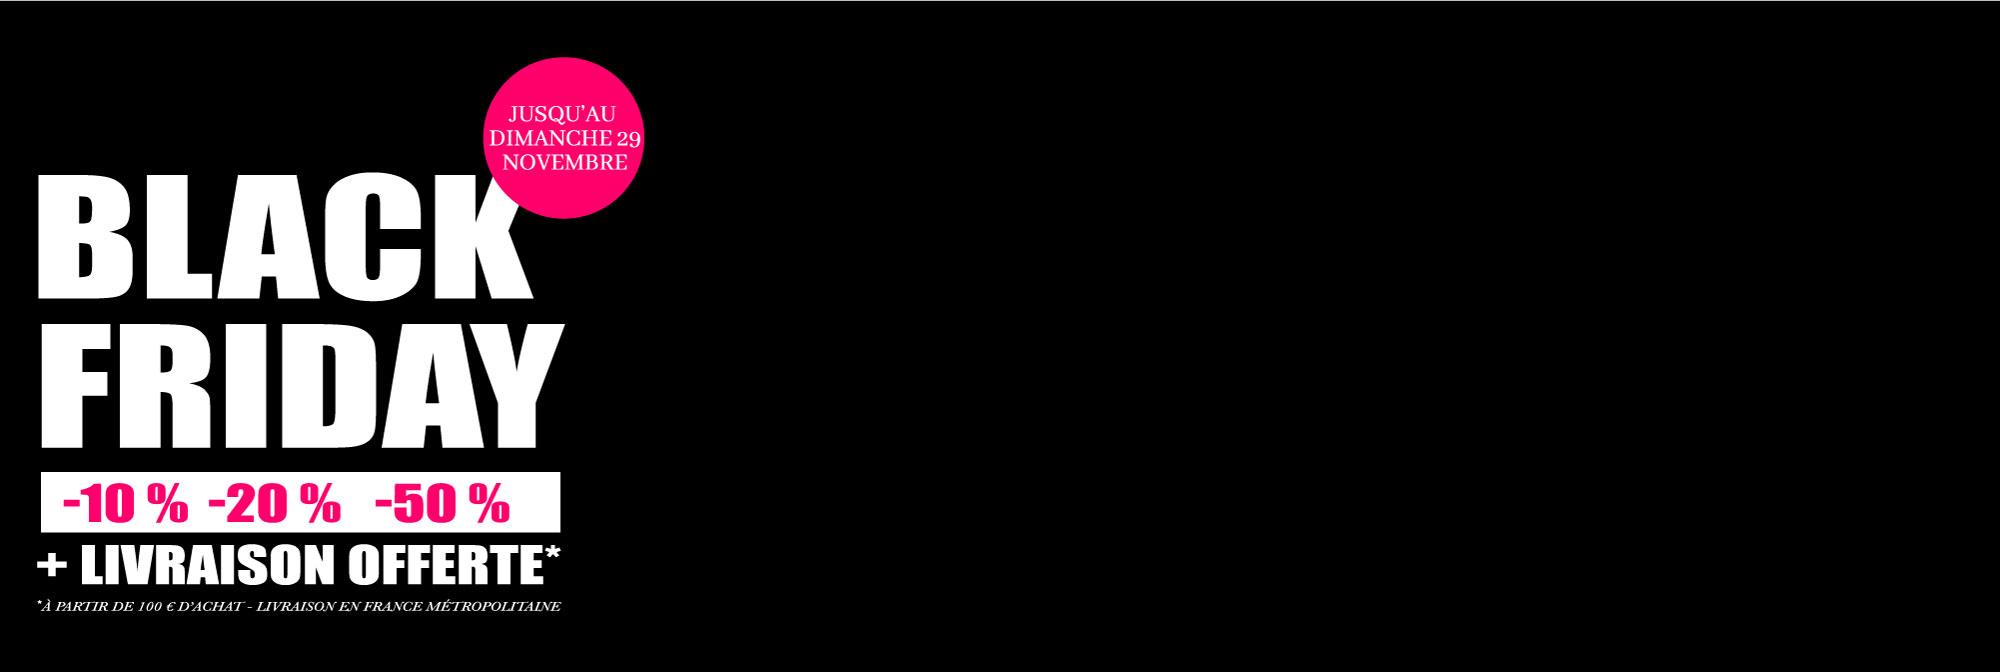 slider 1 BLACK FRIDAY 2020